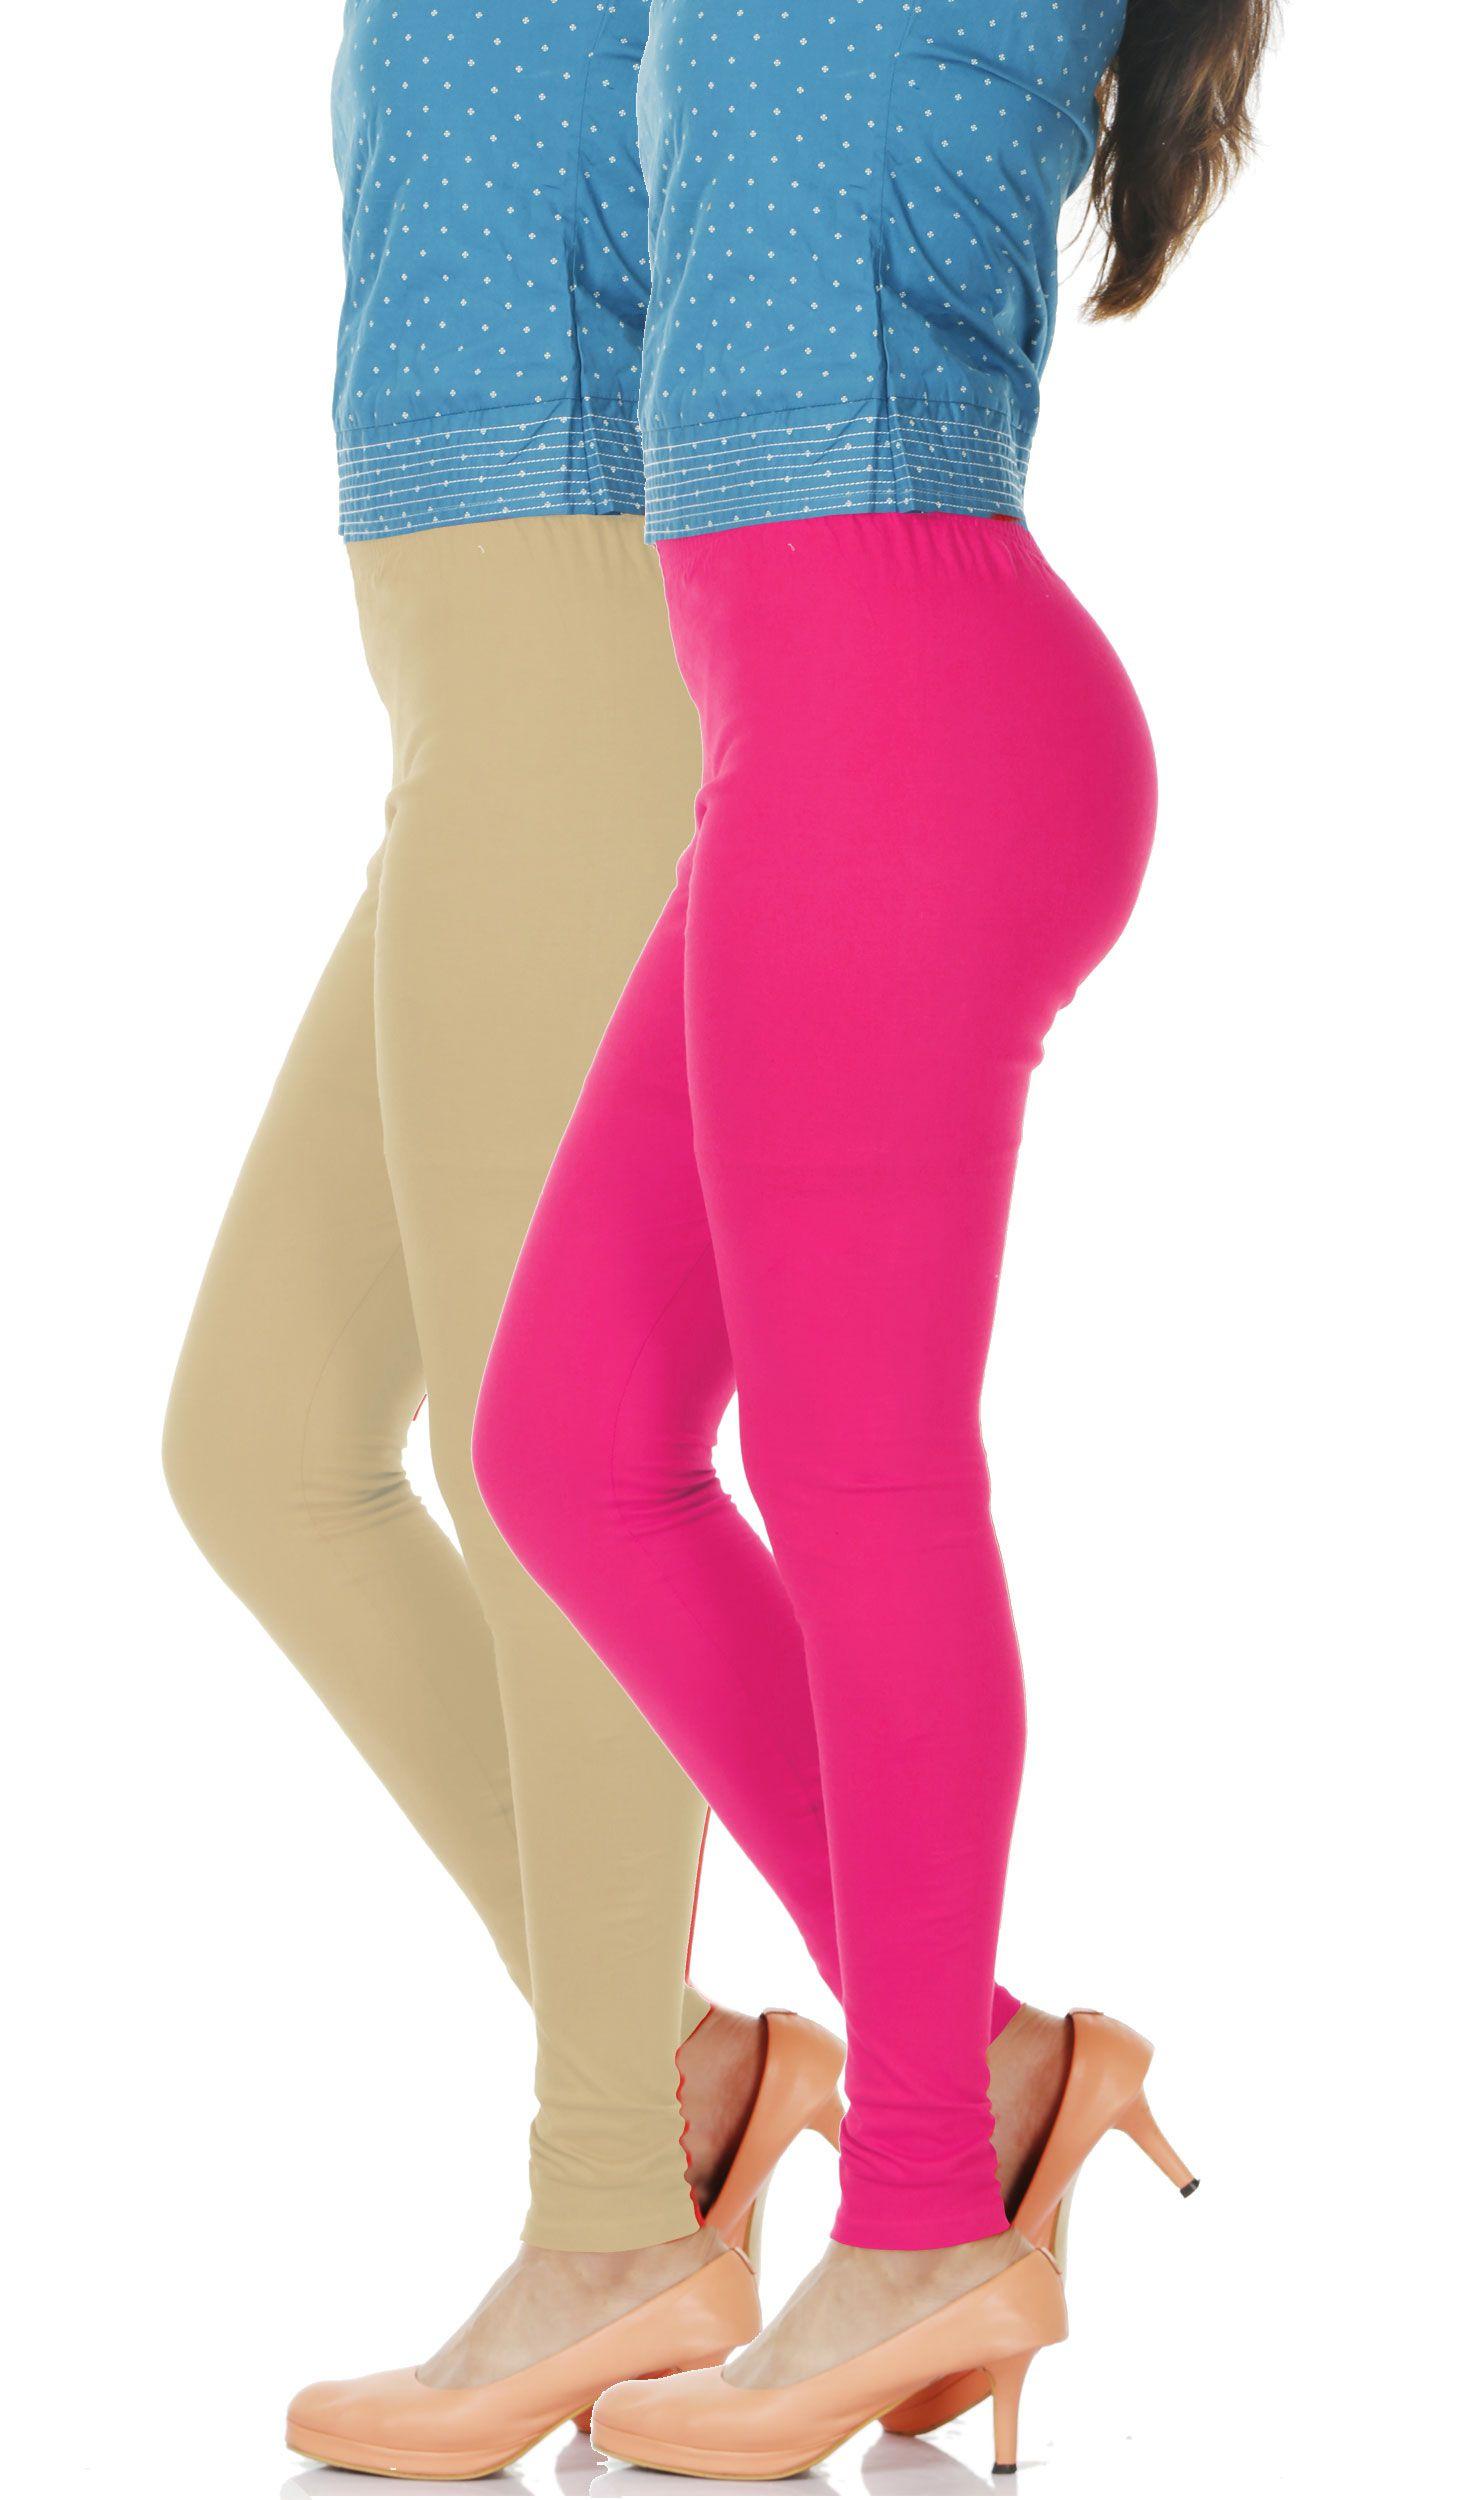 ACTIVE BASIC Cotton Lycra Pack of 2 Leggings